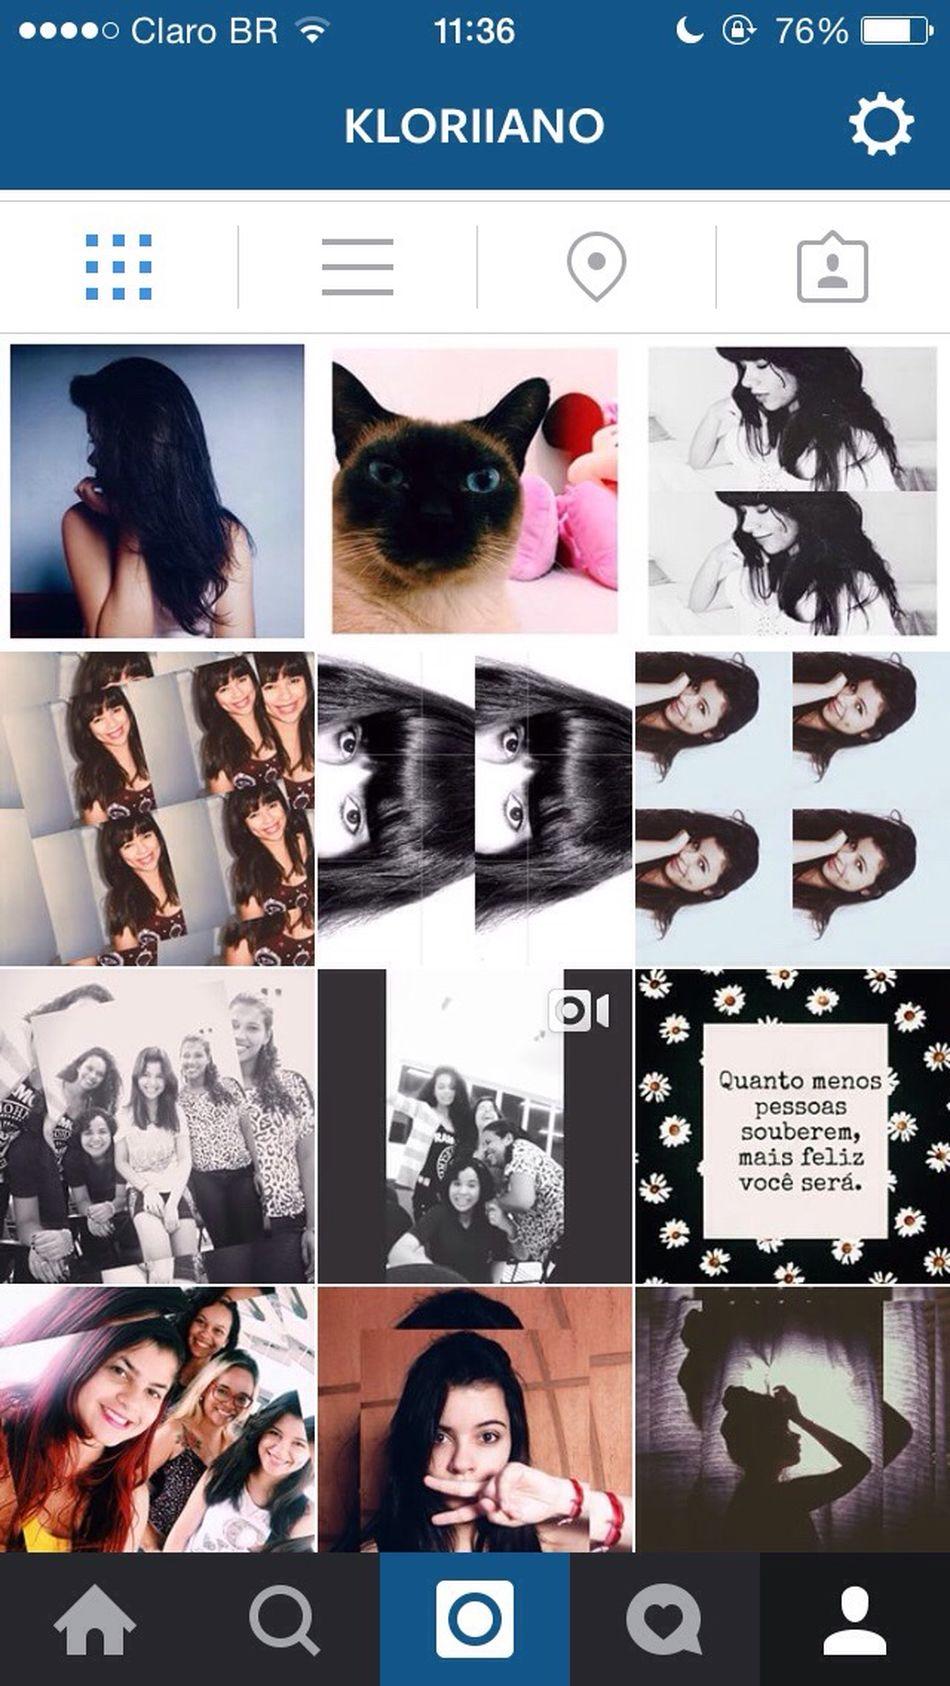 Followme Sigamme Instagram Followback Coliriossinsta Follow